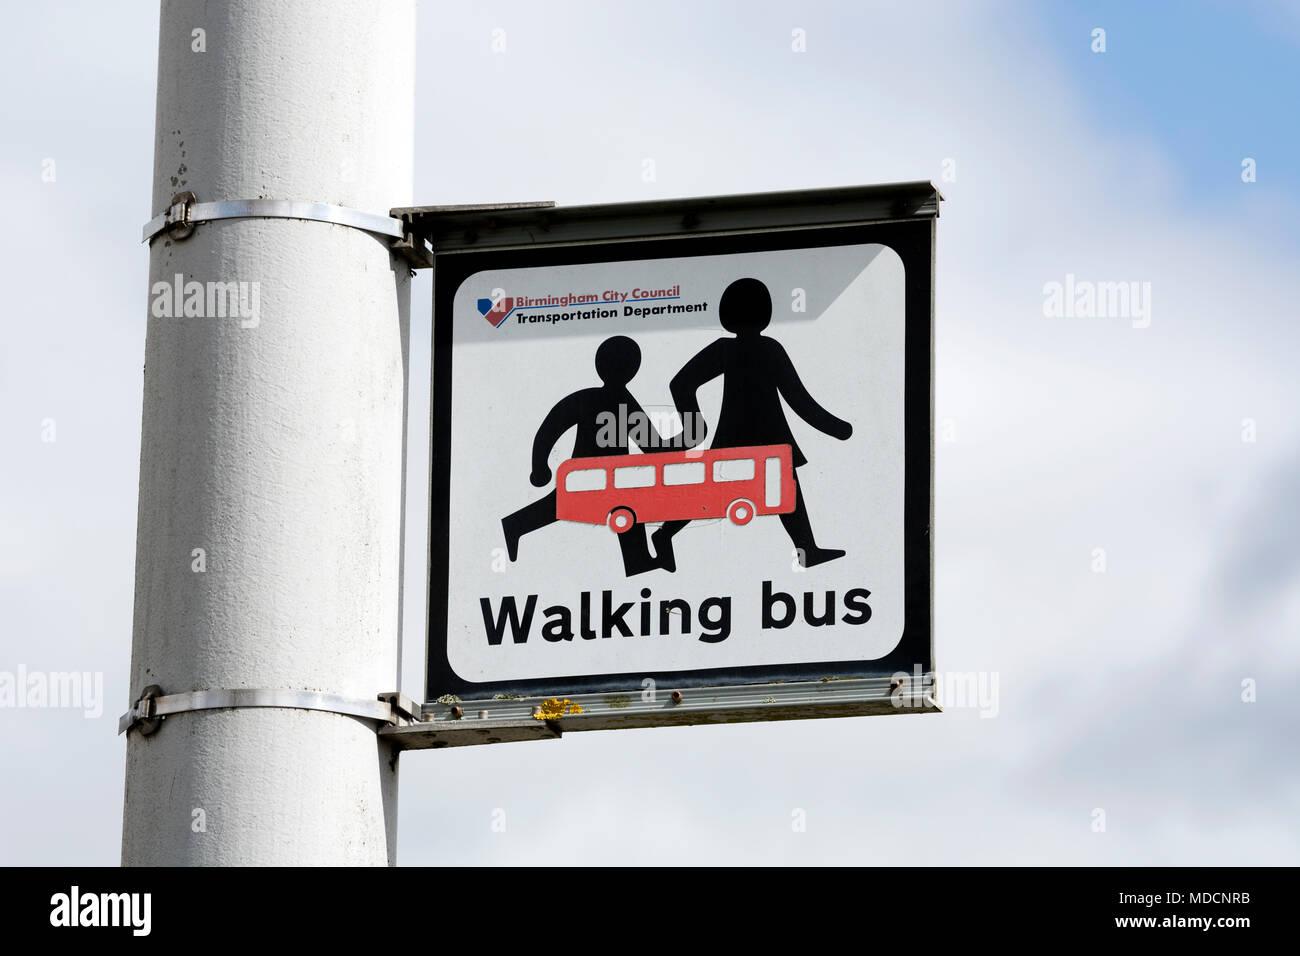 Walking bus sign, Birmingham, West Midlands, UK - Stock Image